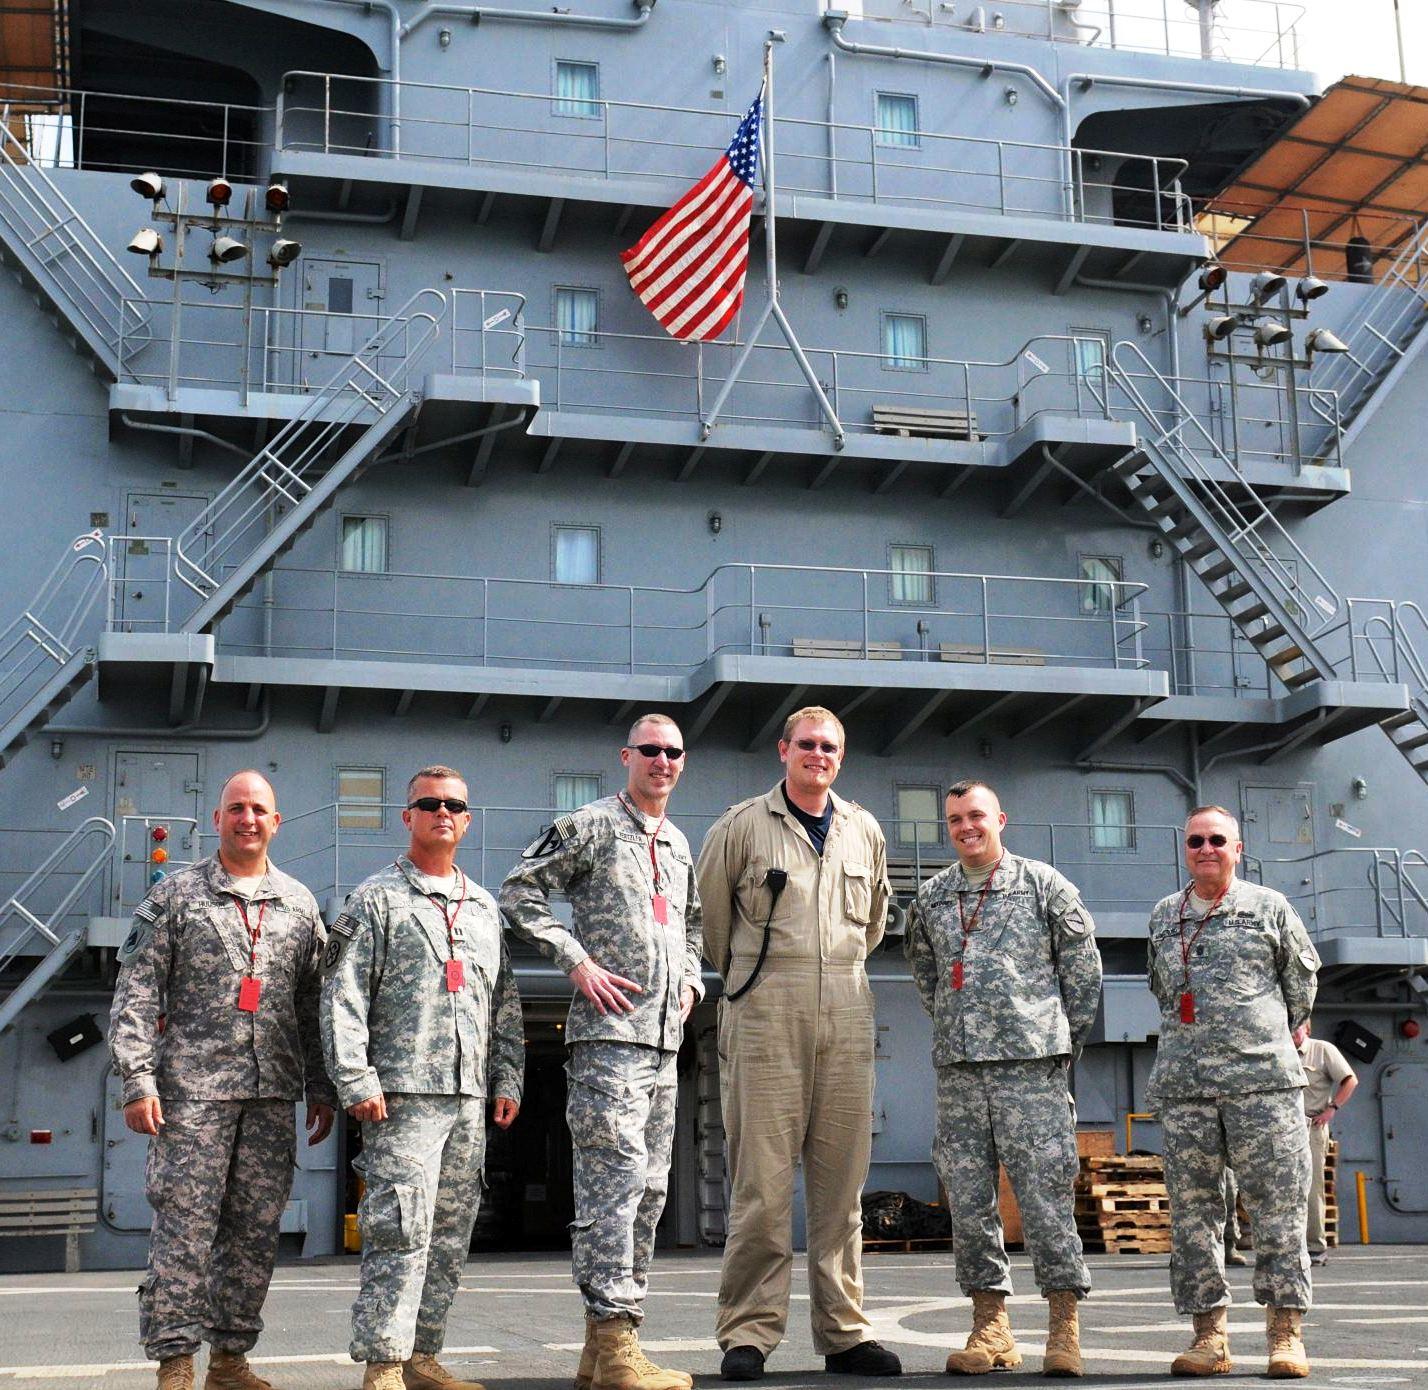 Kentucky VIPs Visit the USNS Joshua Humphreys